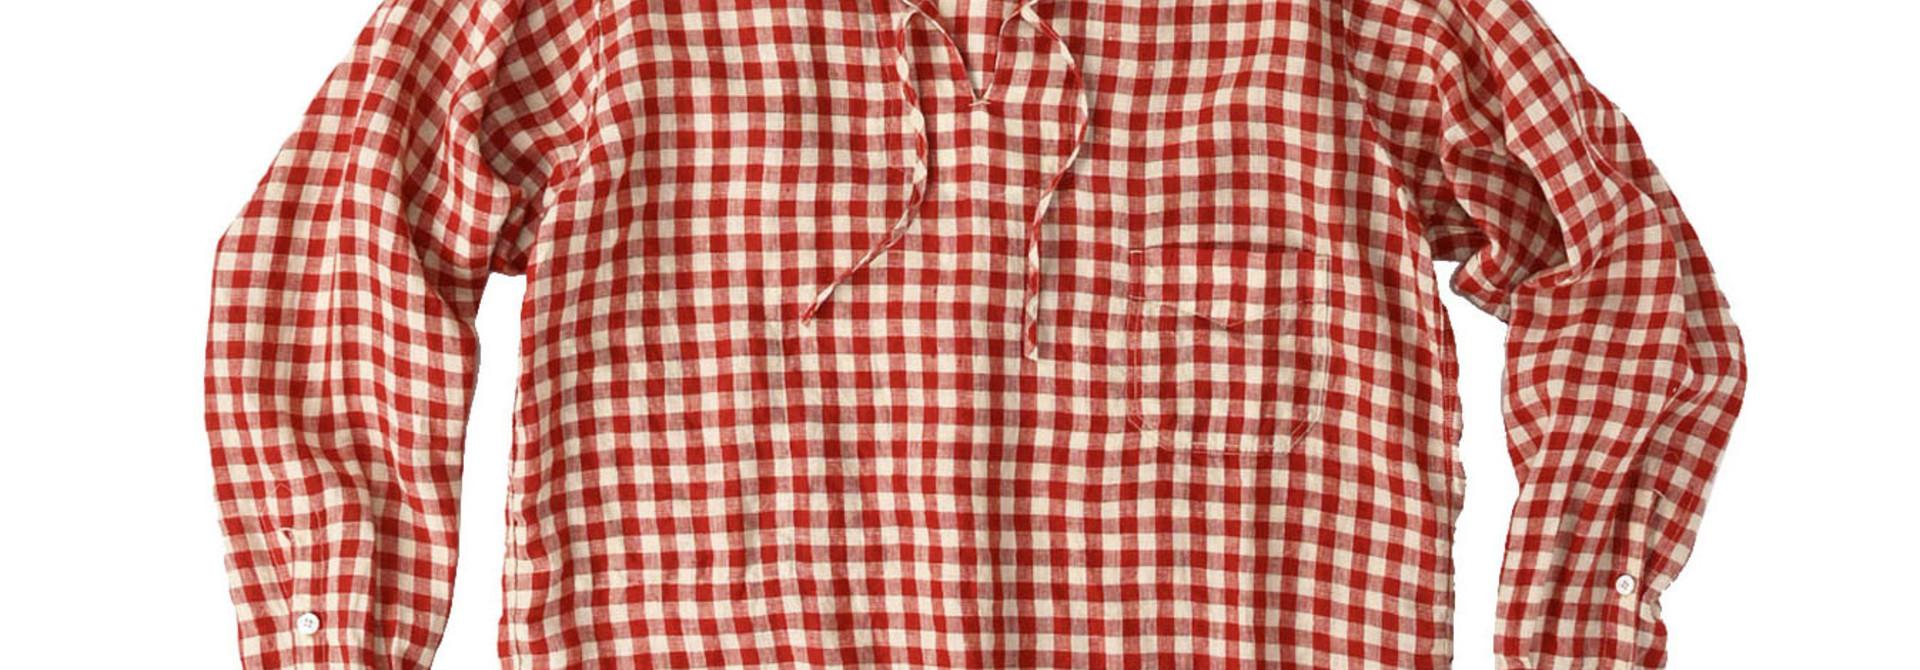 Indian Gauze Linen Capri Shirt